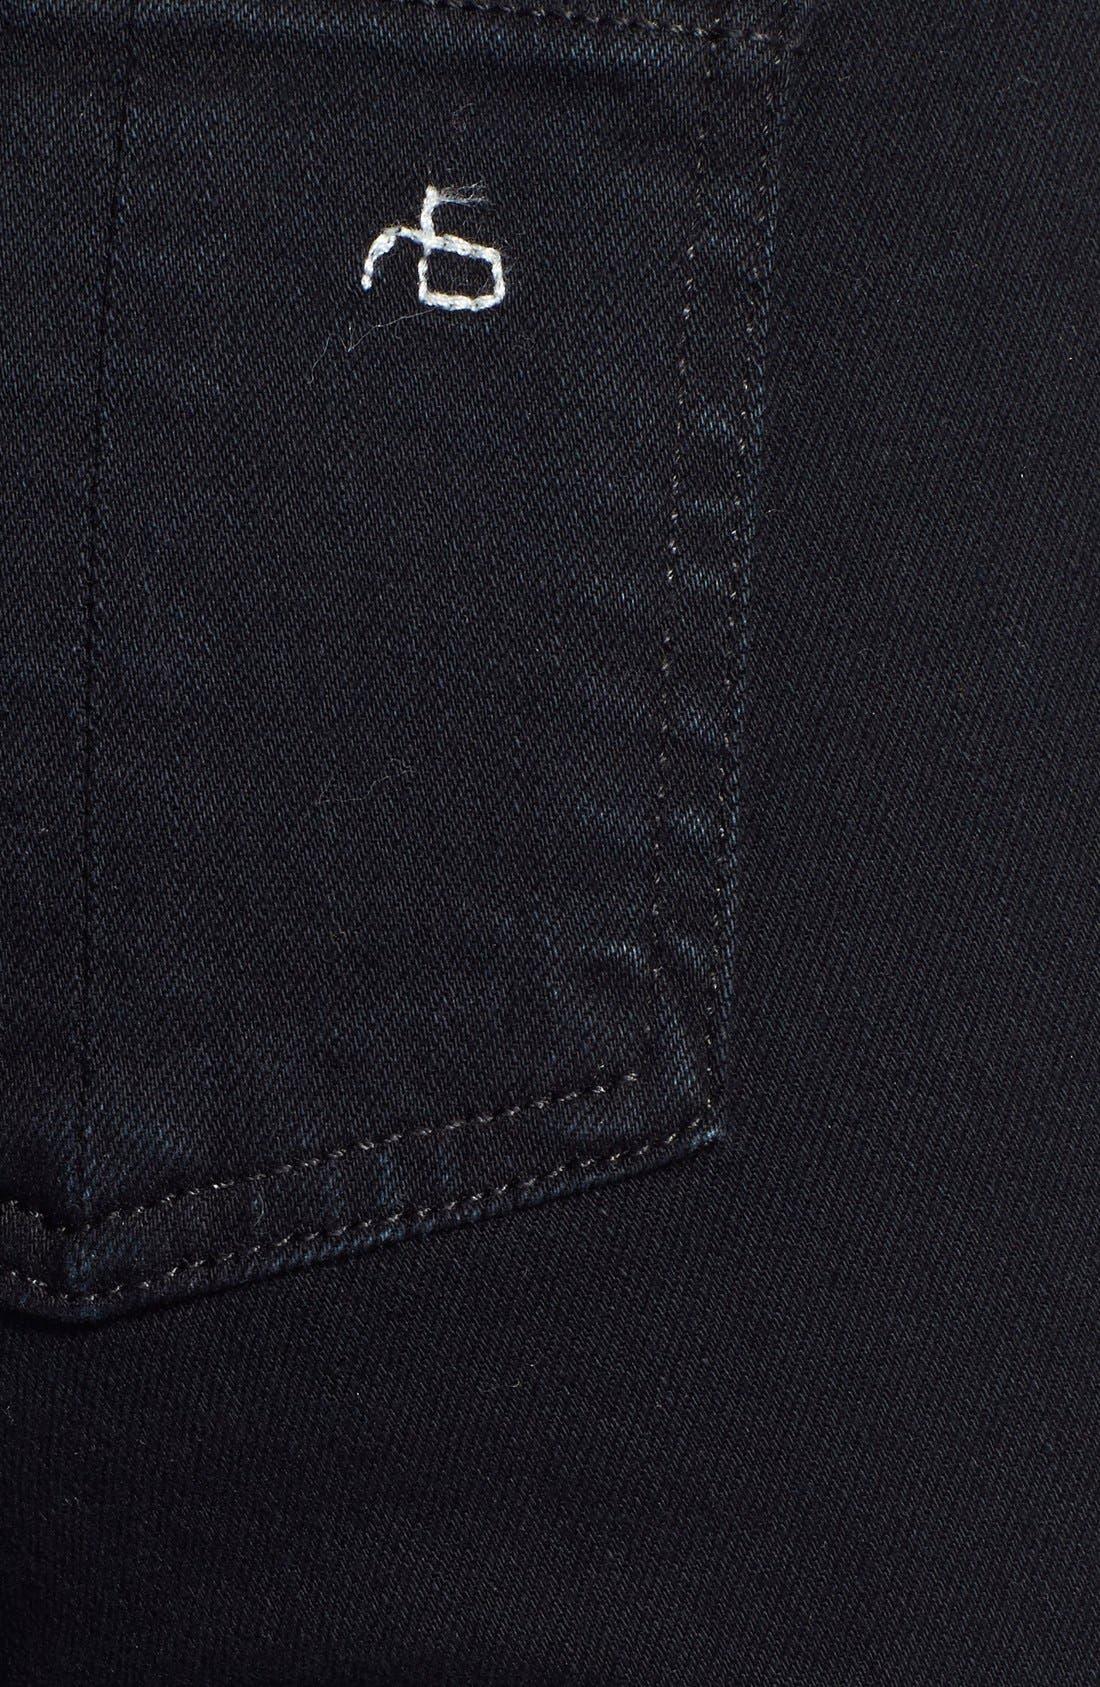 RAG & BONE, 'The Skinny' Stretch Jeans, Alternate thumbnail 10, color, COAL